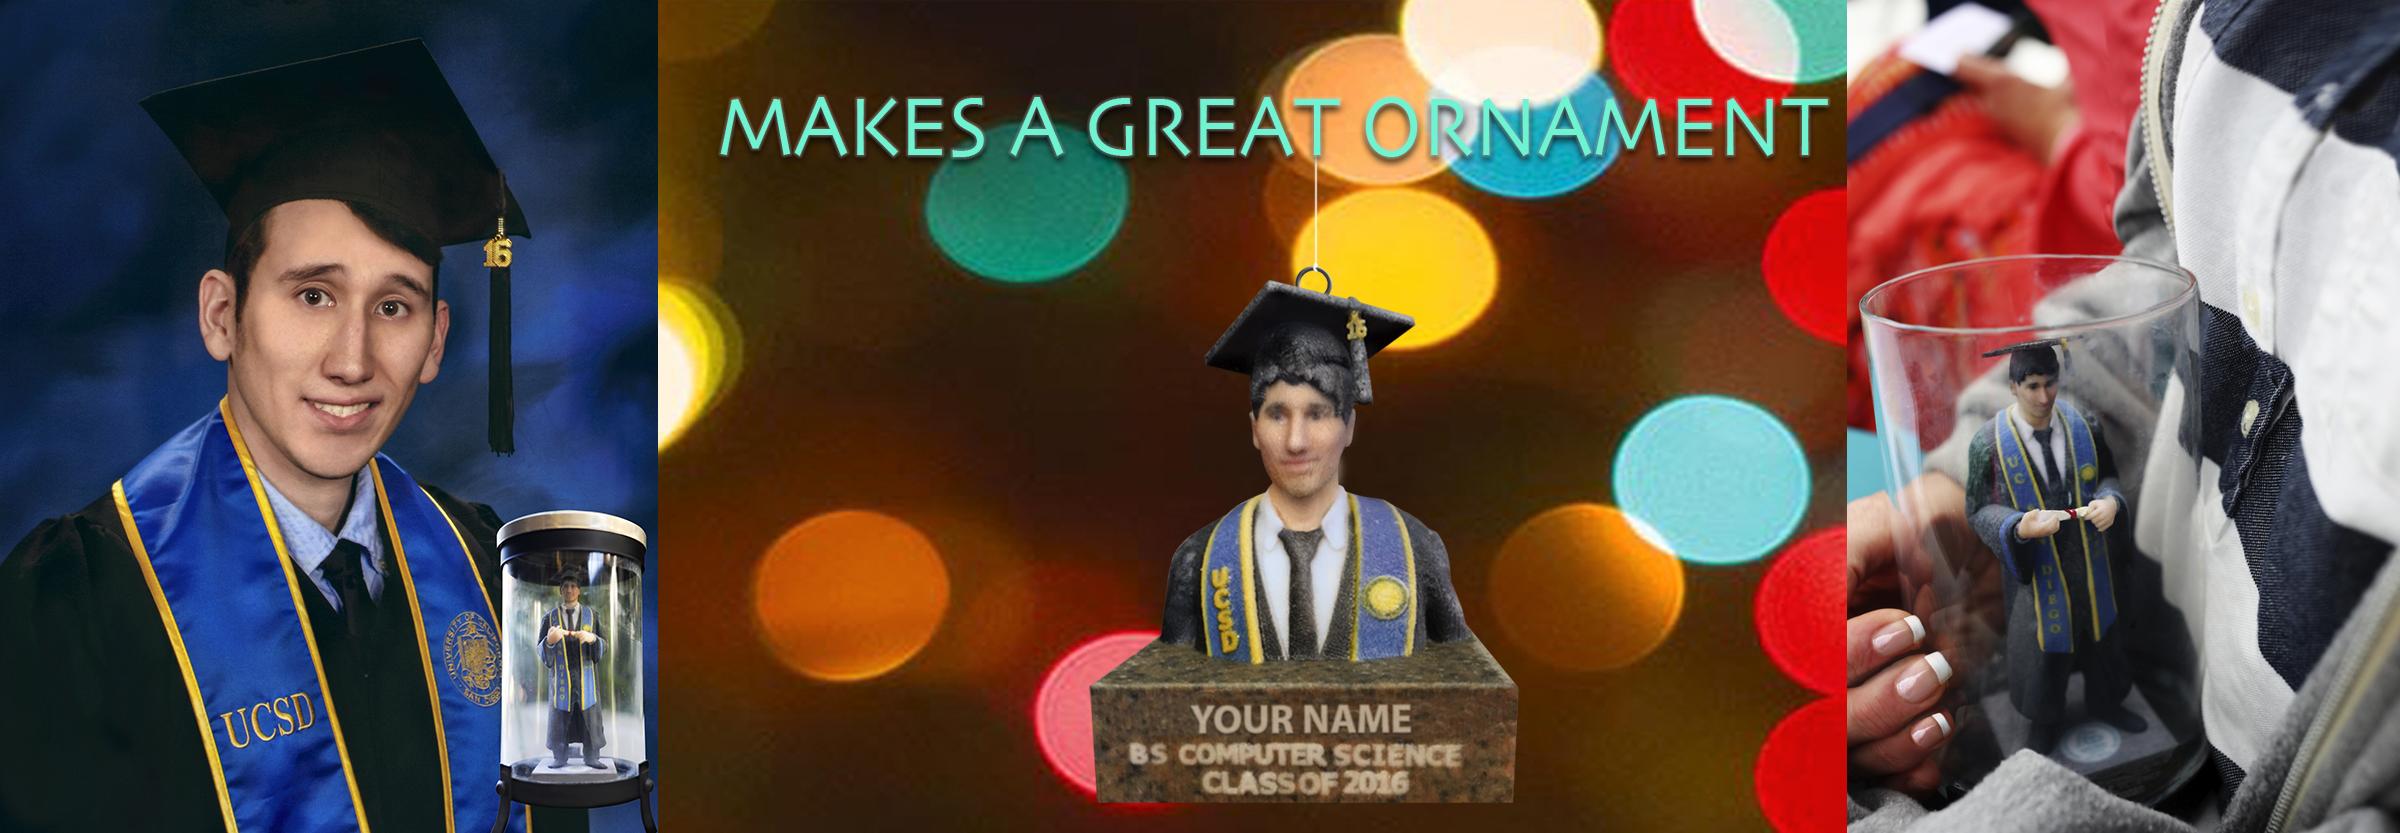 UCSD Grad 2016